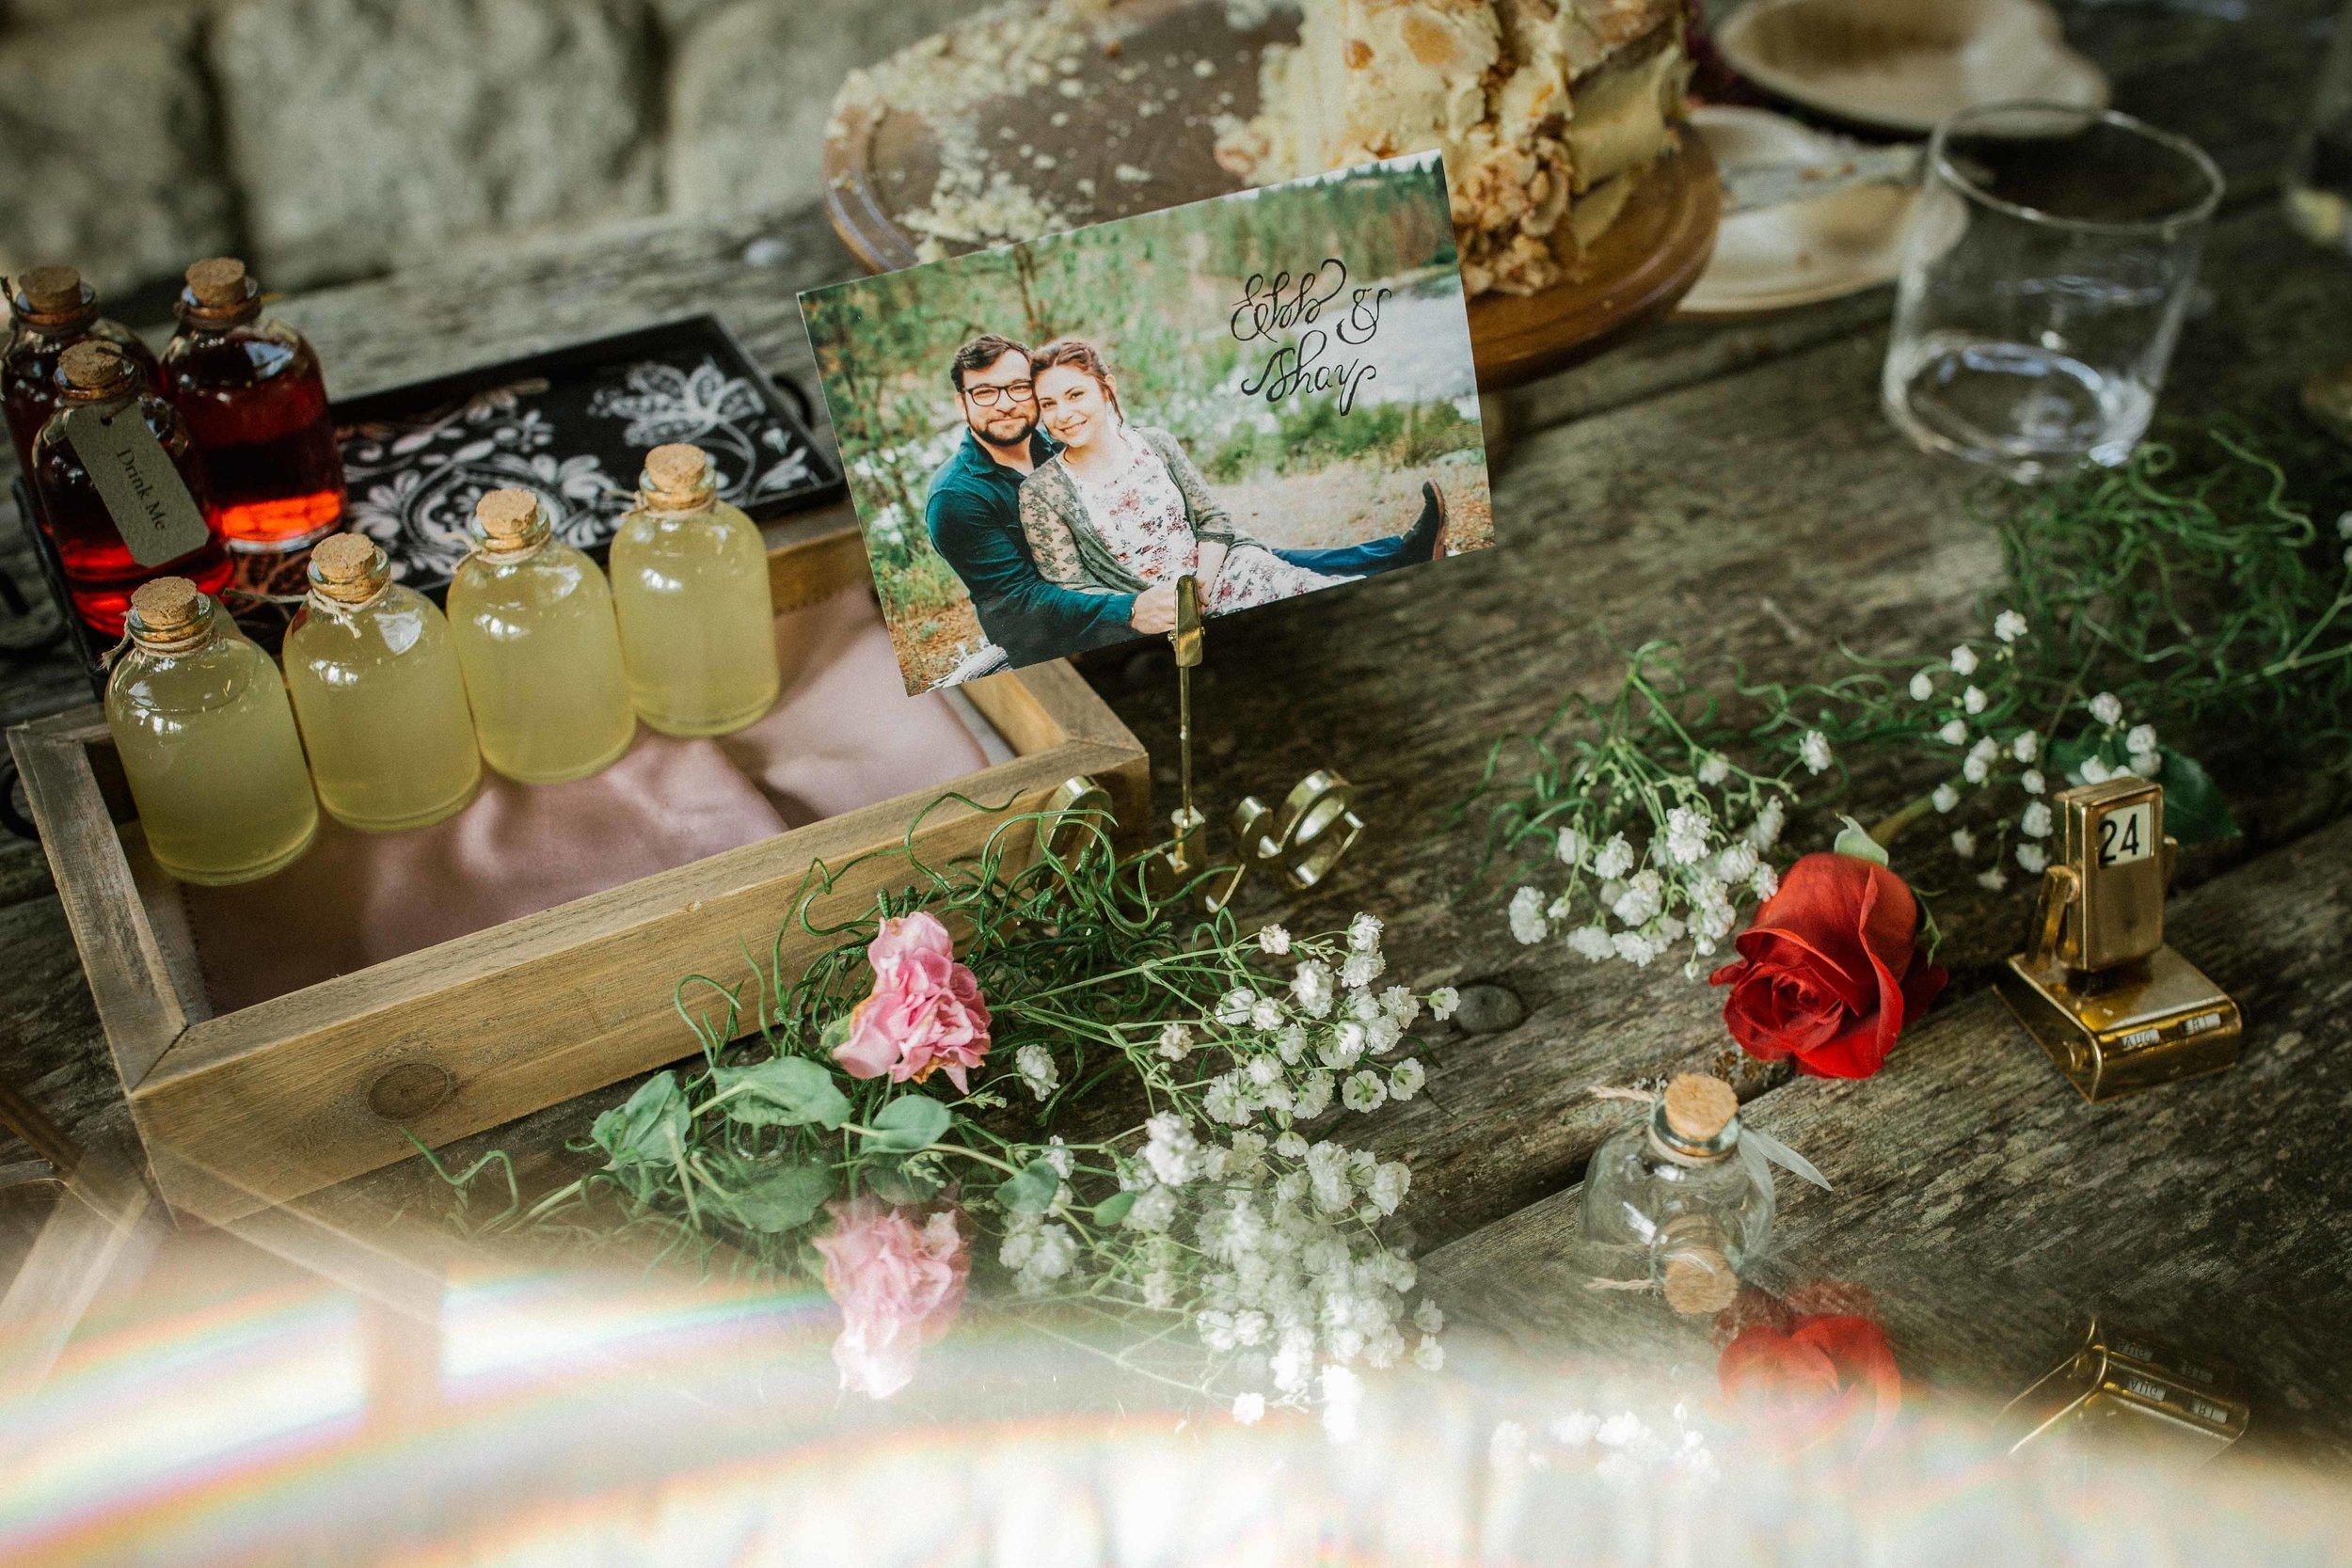 deception-pass-wedding-61.jpg